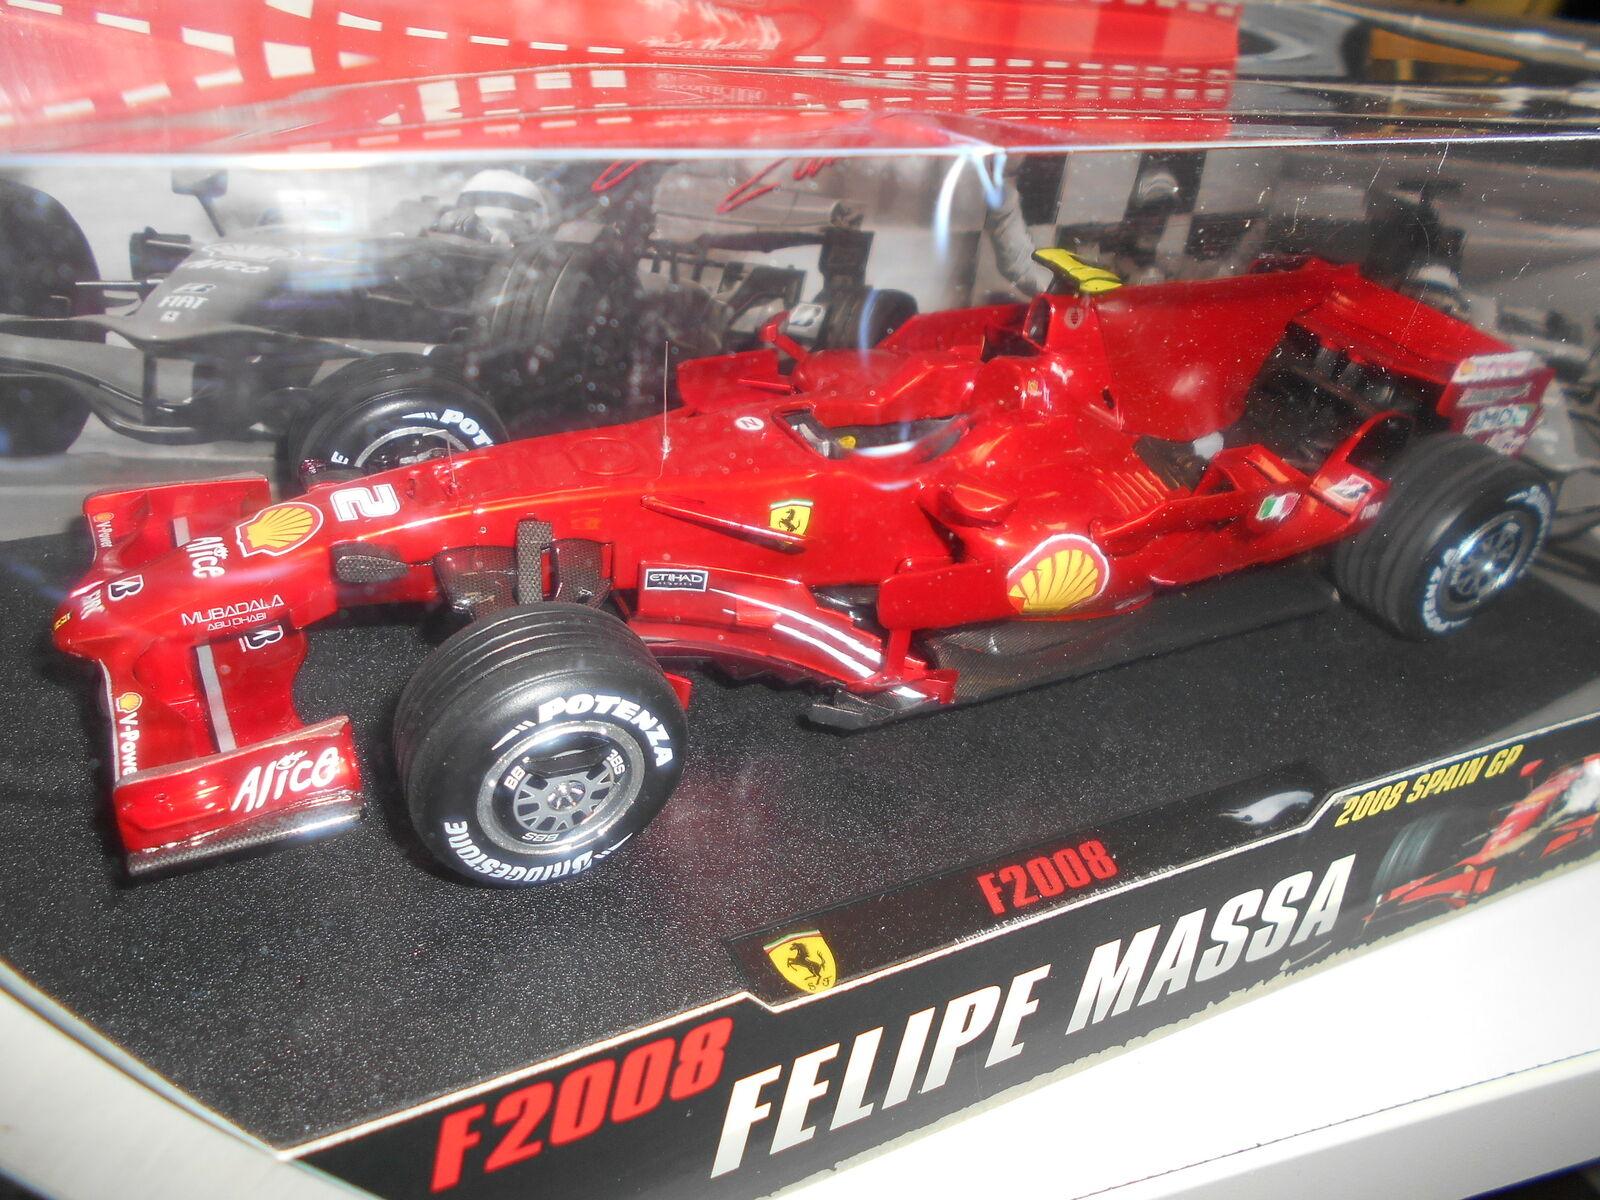 HWEP99967 av varm Hklackar ELITE FERRARI F2008 F.MASSA SPANSH GP 2008 1 18